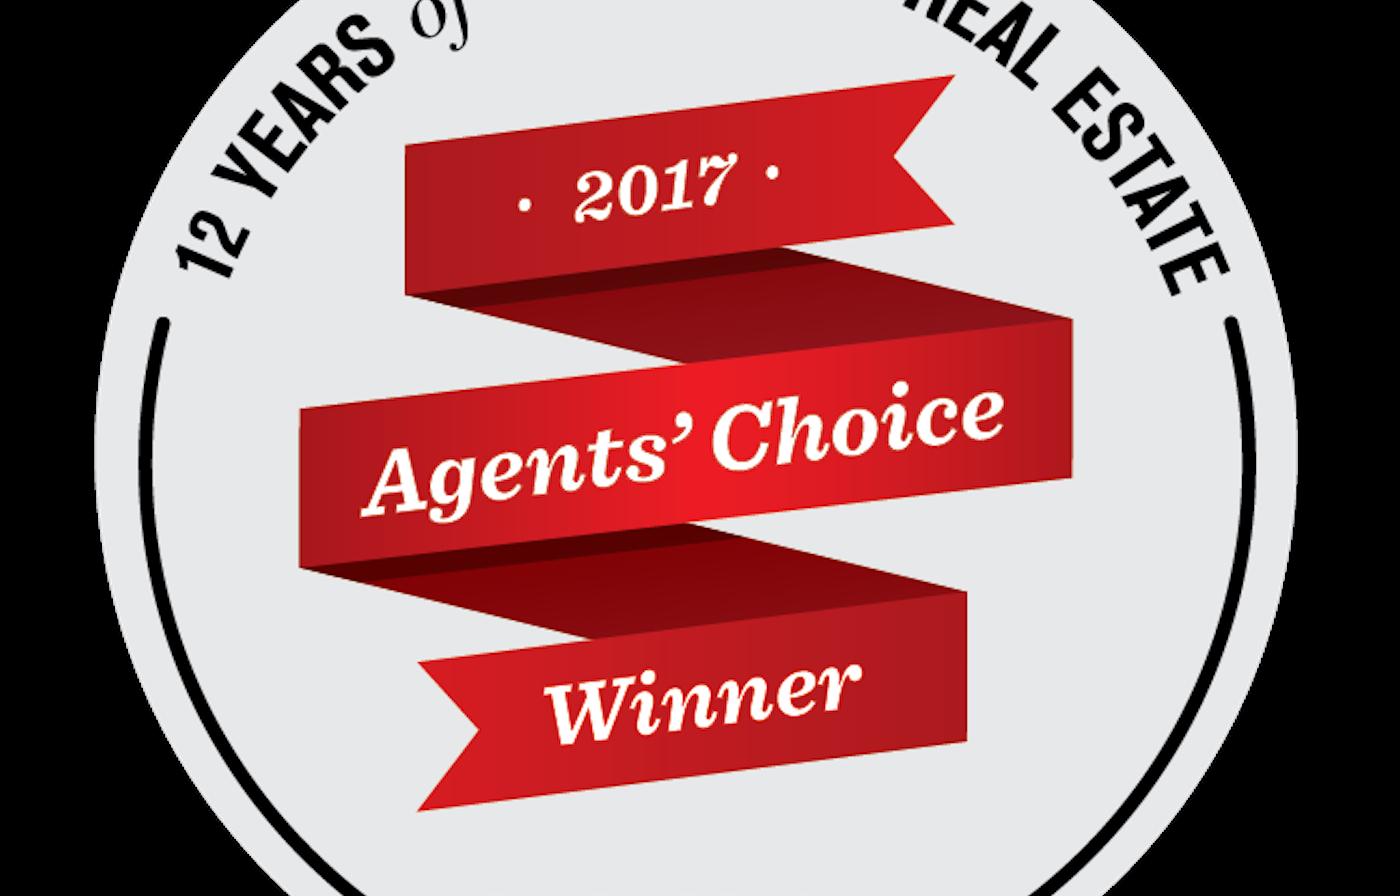 2017 Development Of The Year Badge